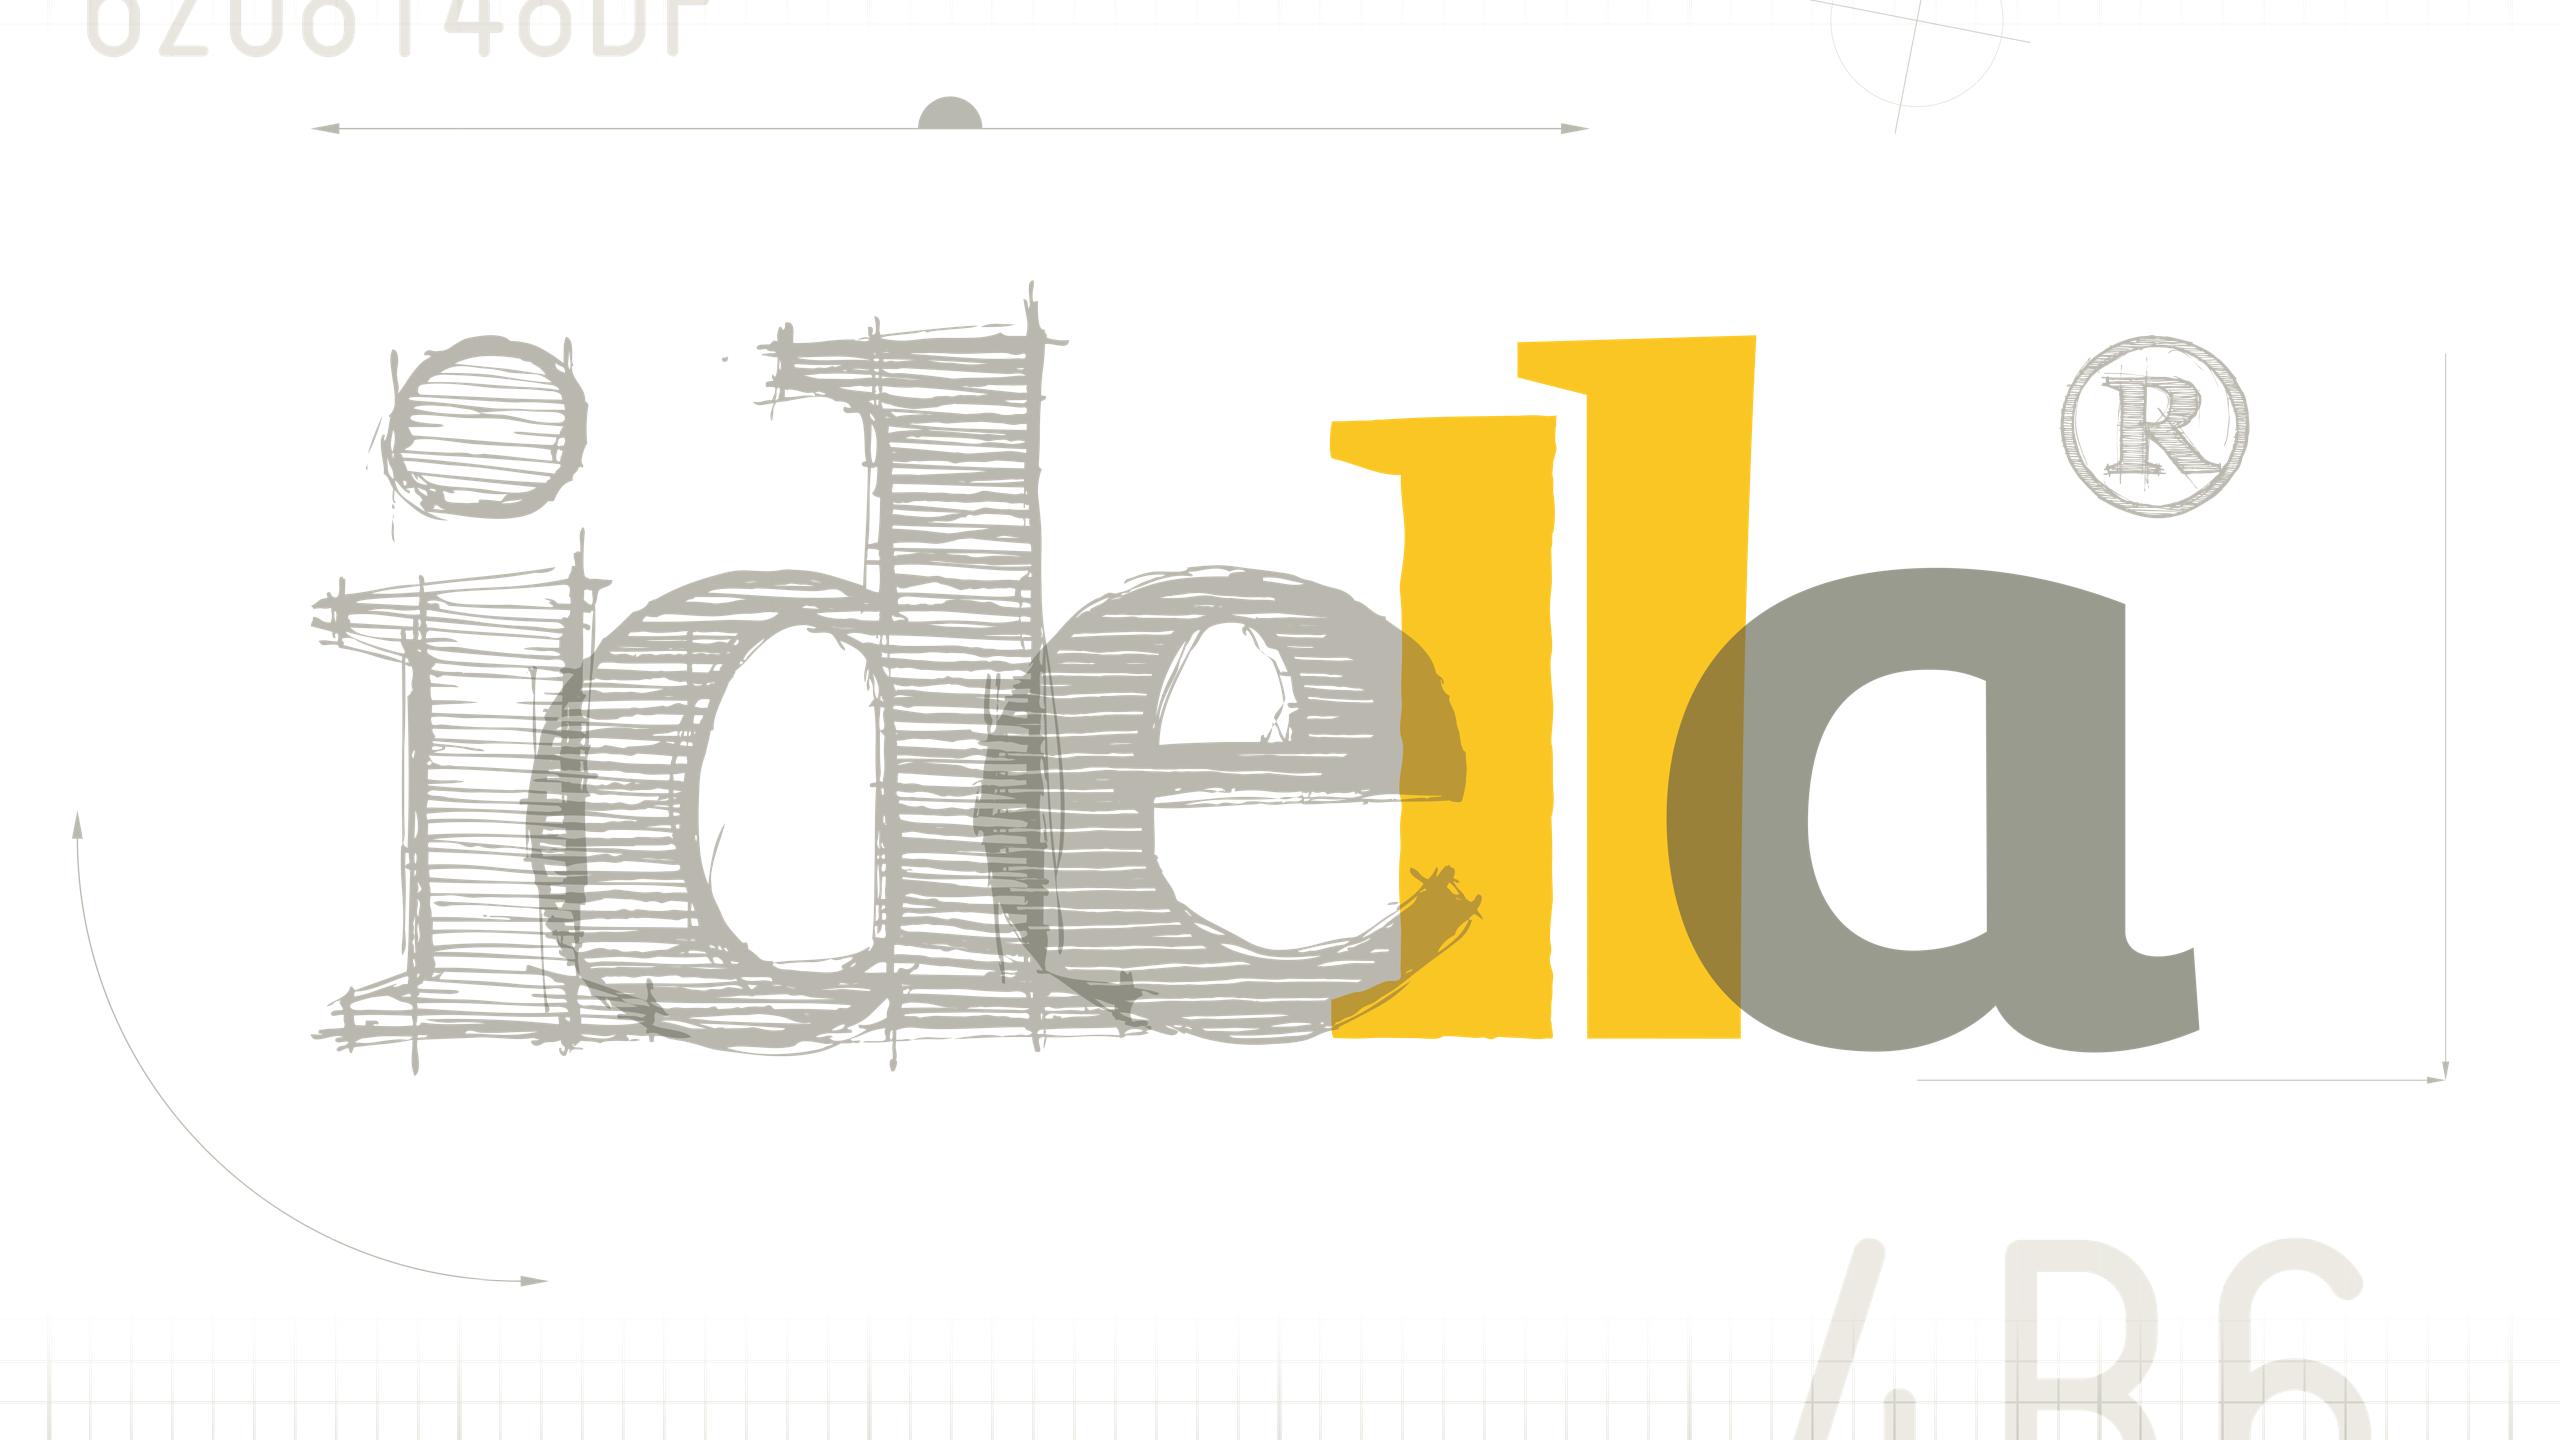 logo Idella